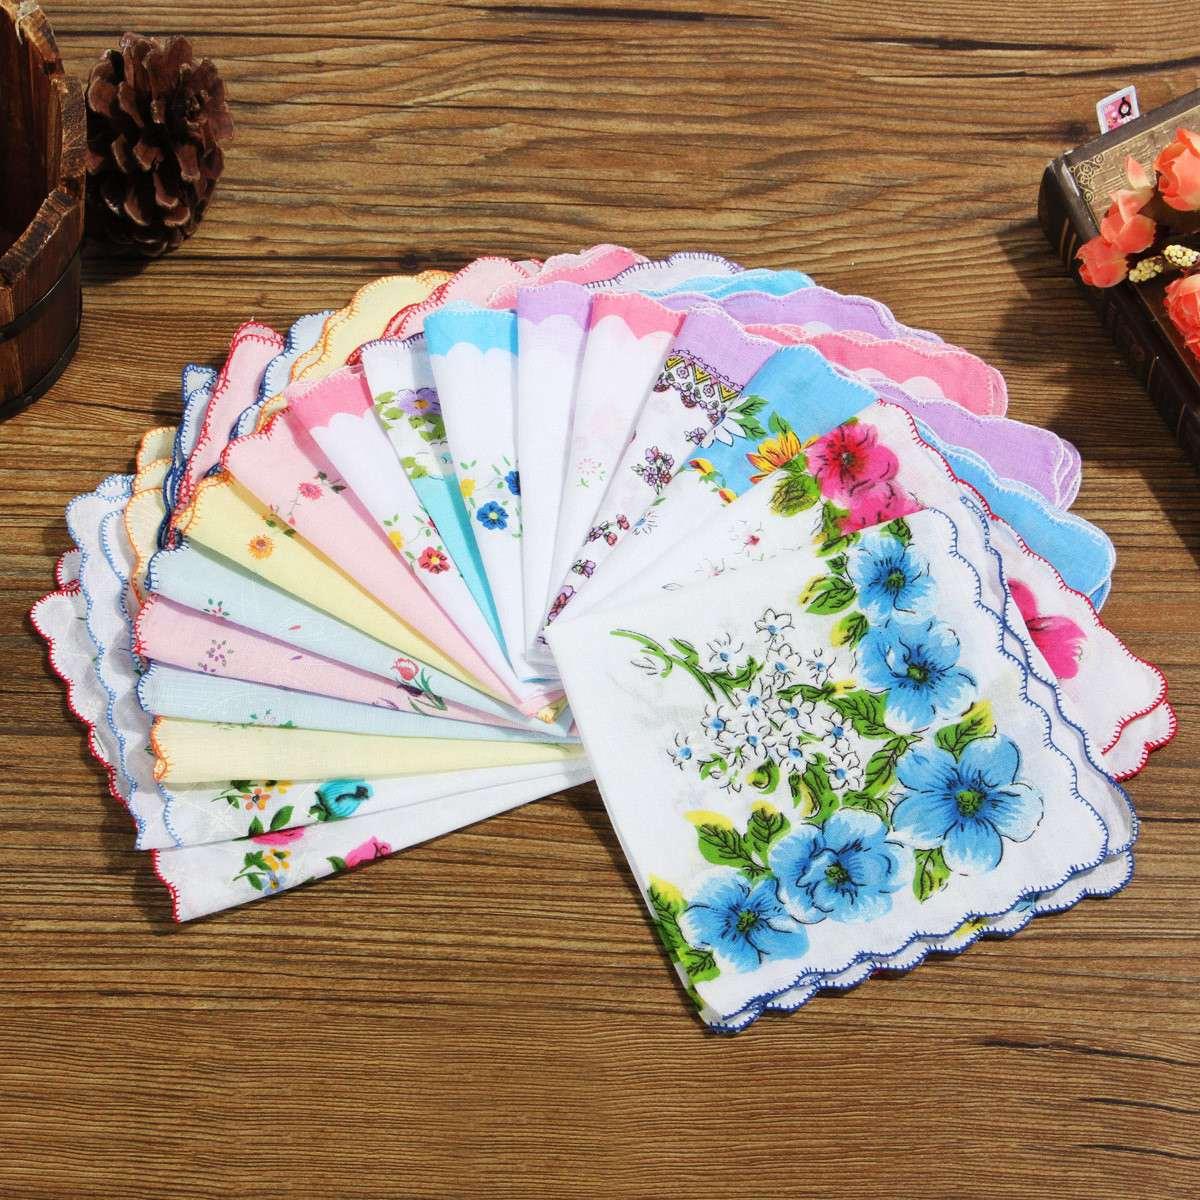 New 50x Flower Handkerchiefs Various Cotton Vintage Hankies Floral Lady Women Style Gift 28x28cm